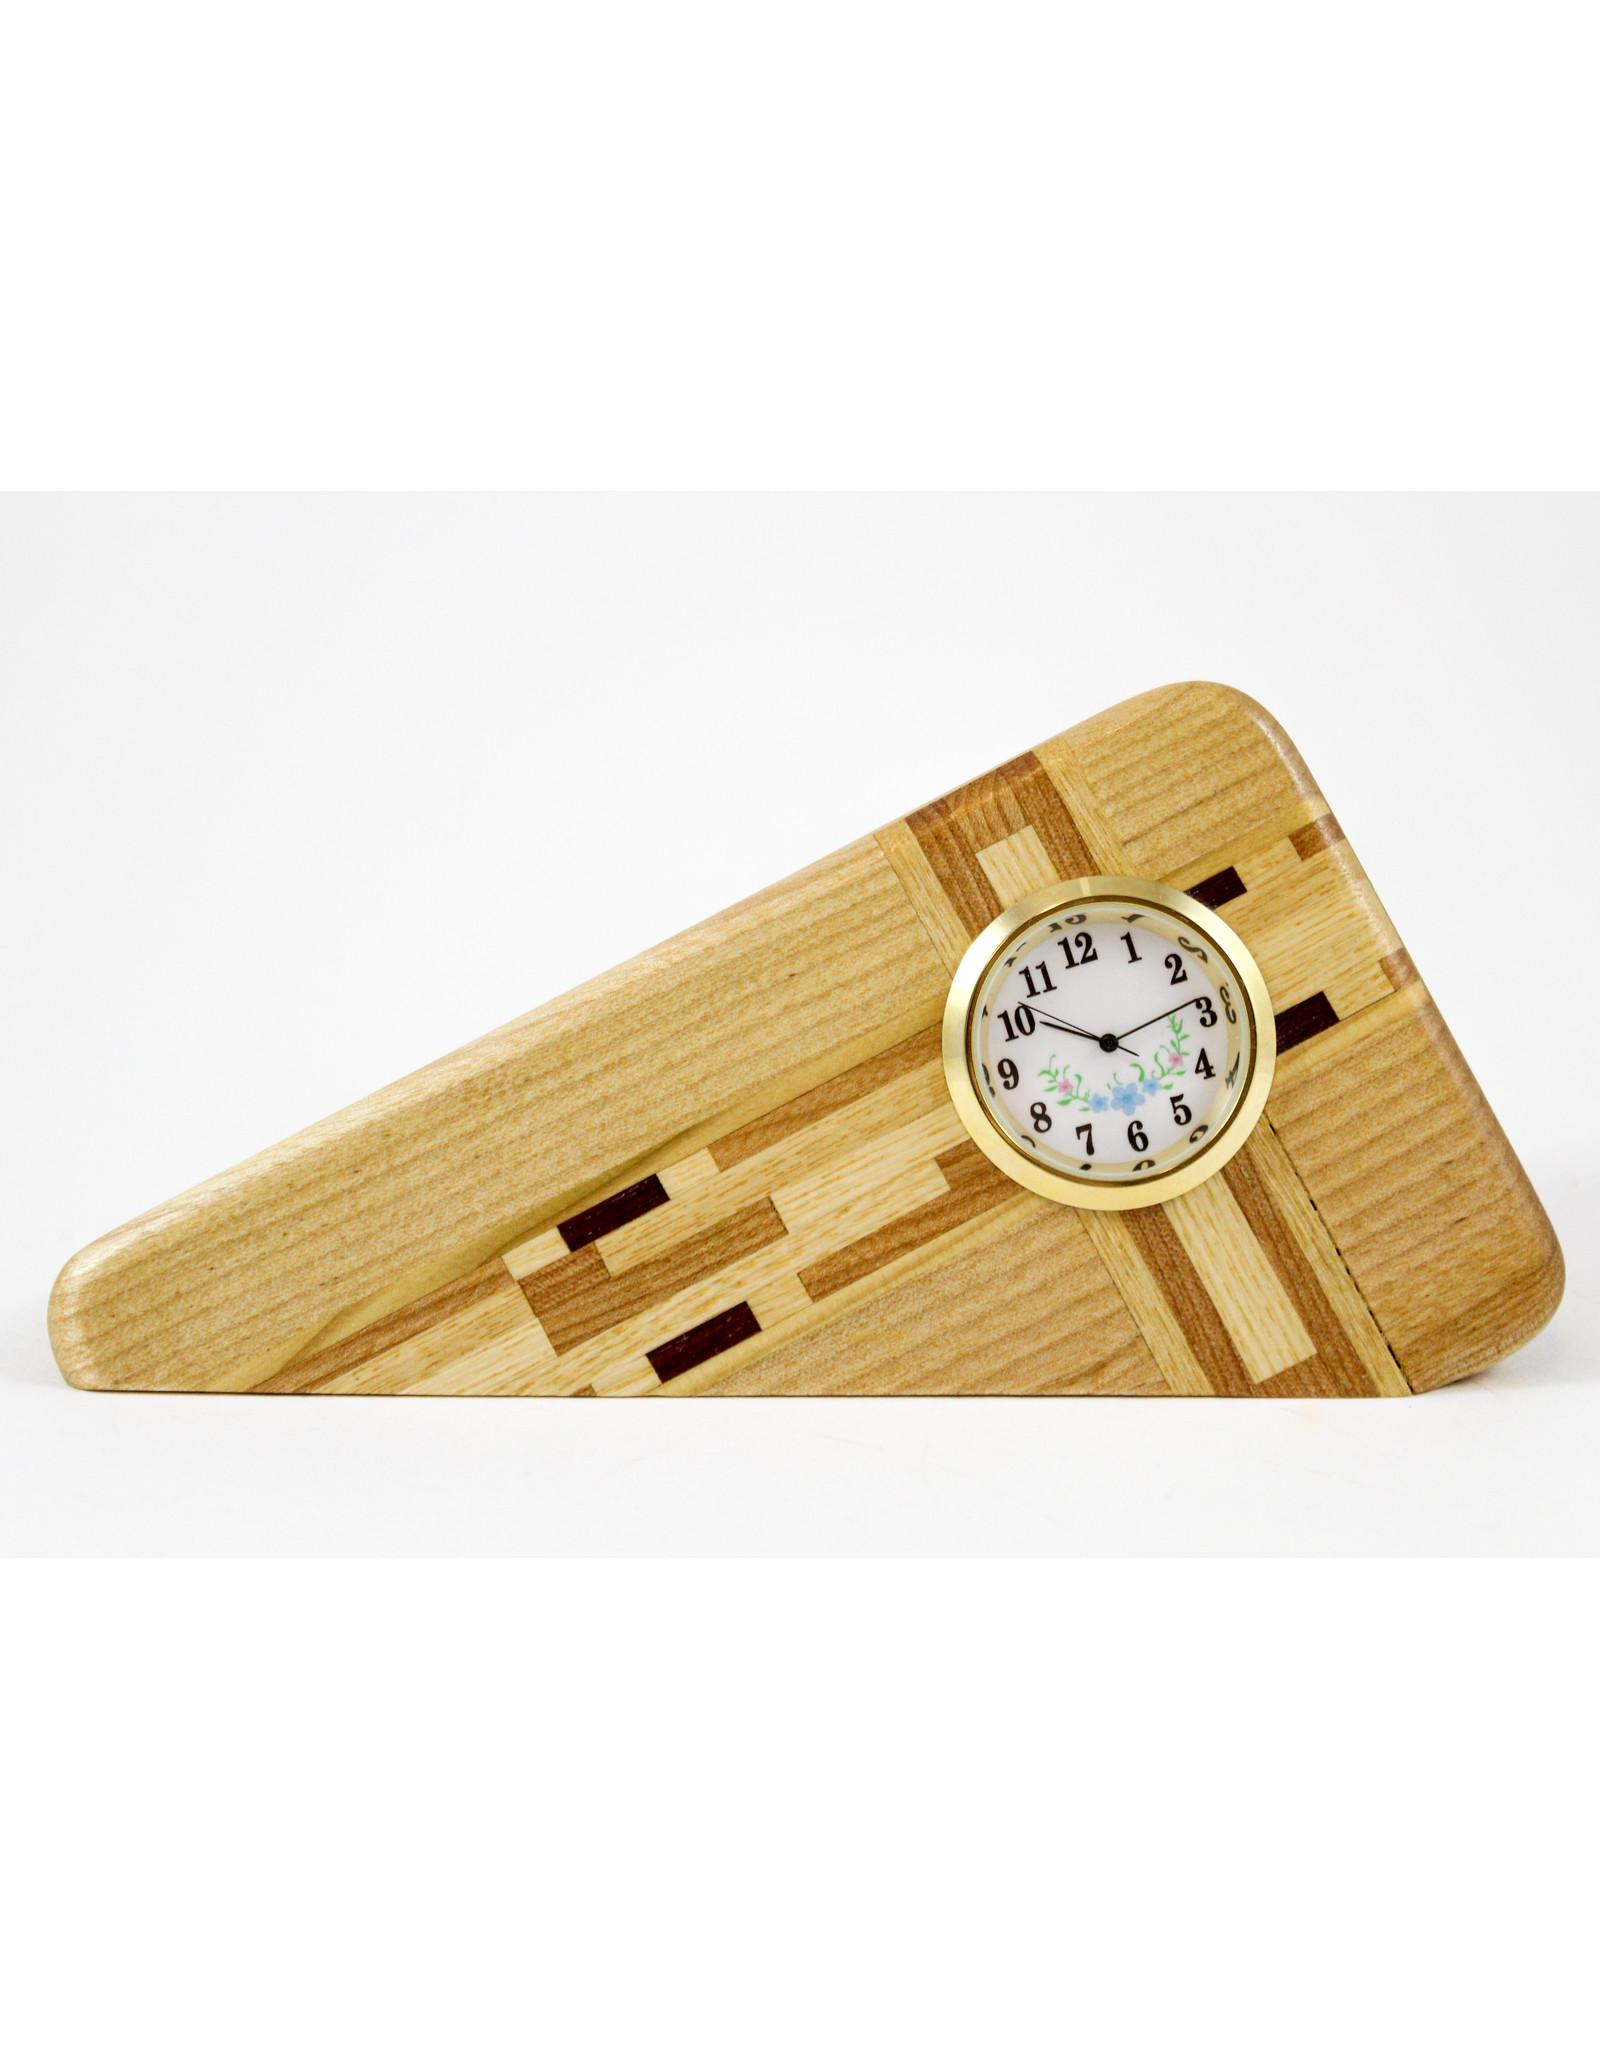 Robert Evans Handcrafted Clock by Woodsmiths